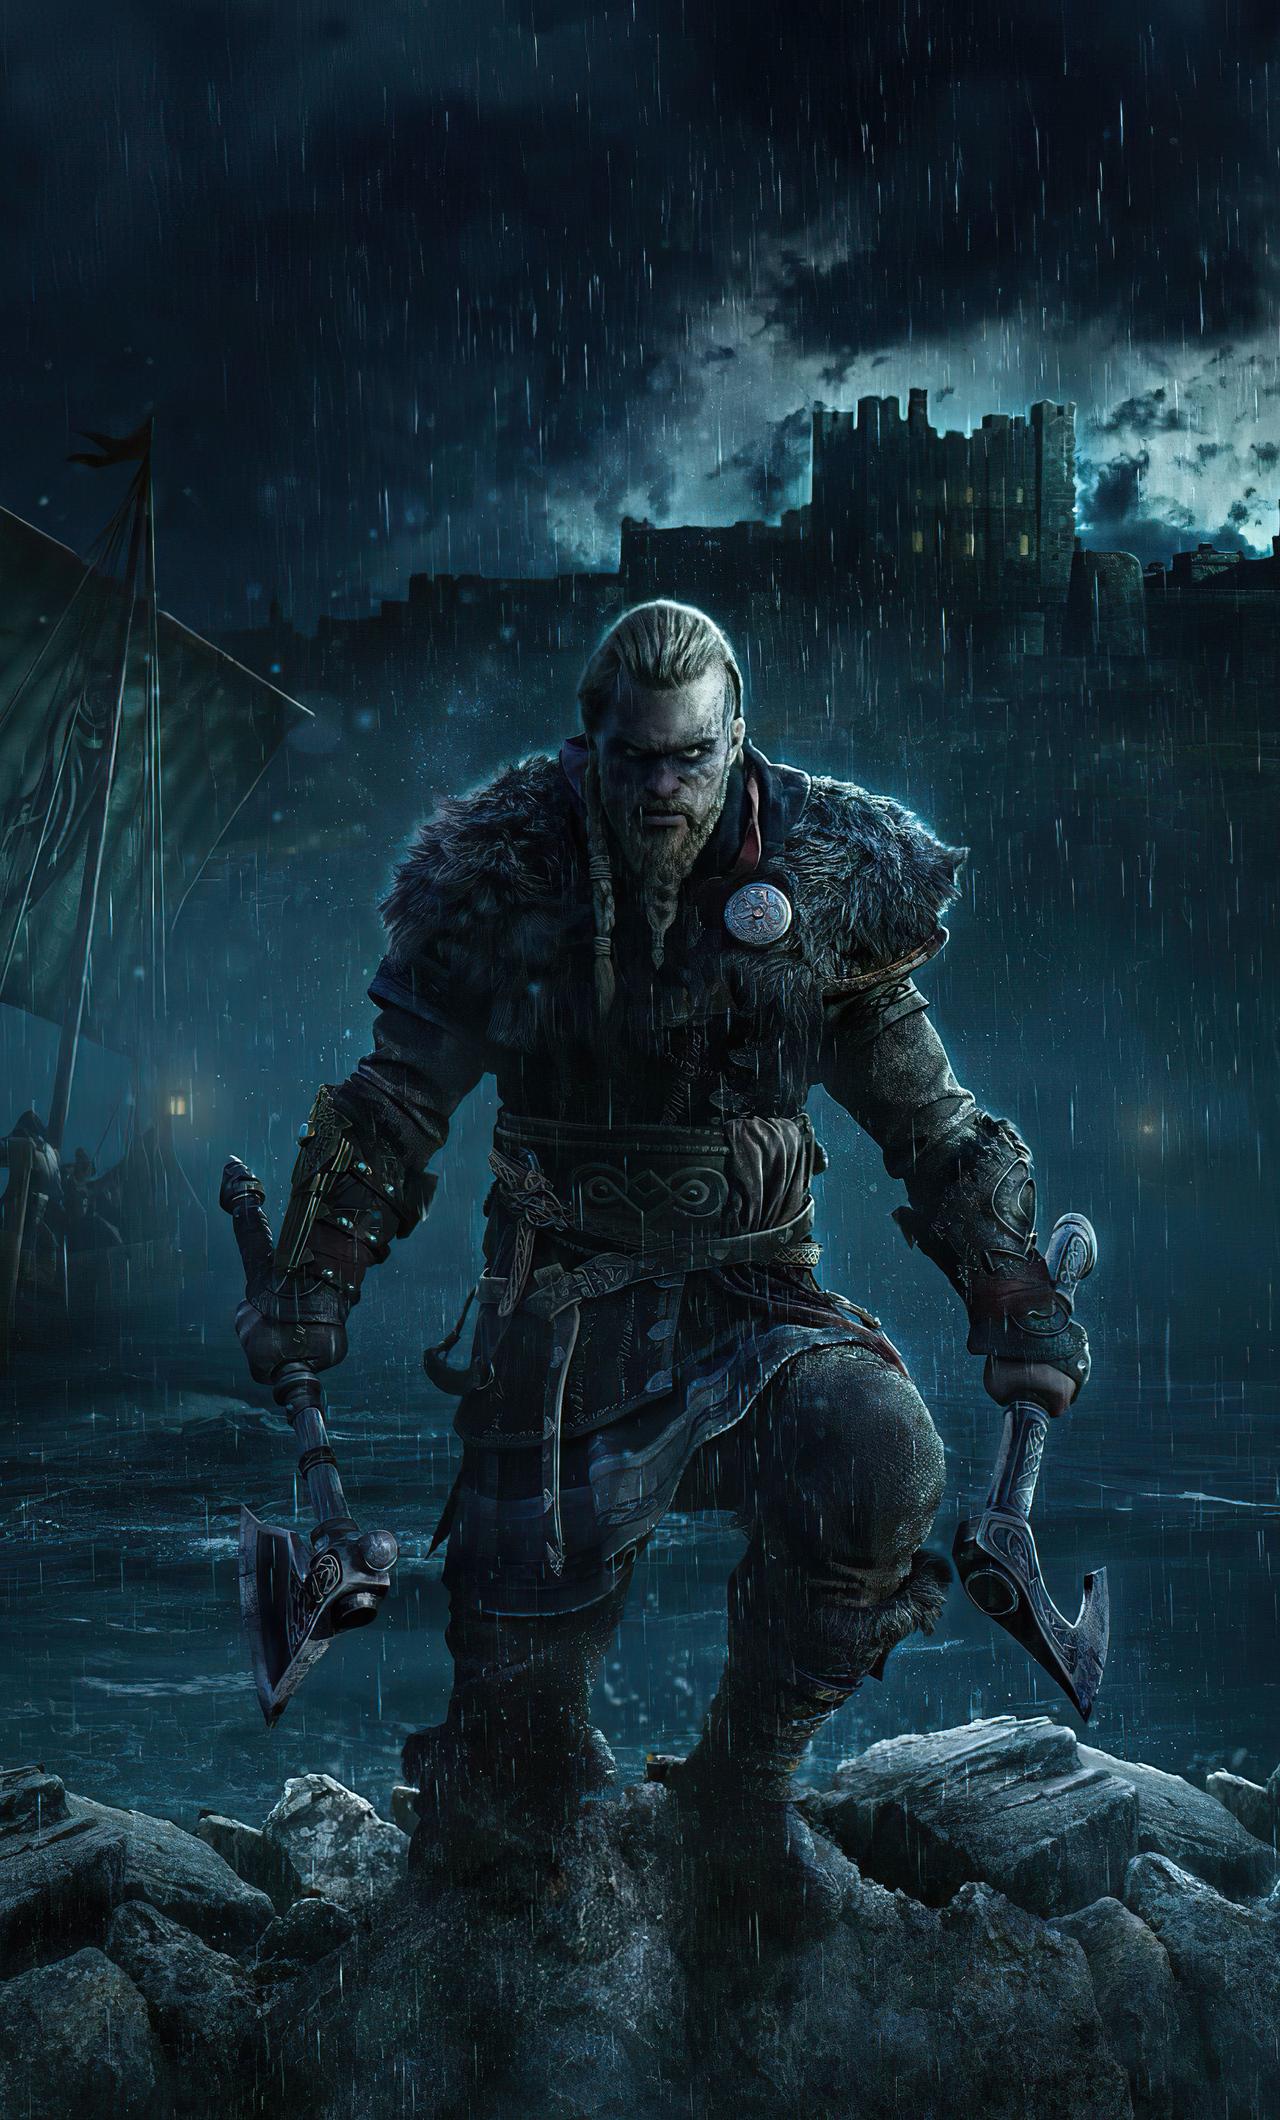 assassins-creed-valhalla-poster-2021-4k-w1.jpg